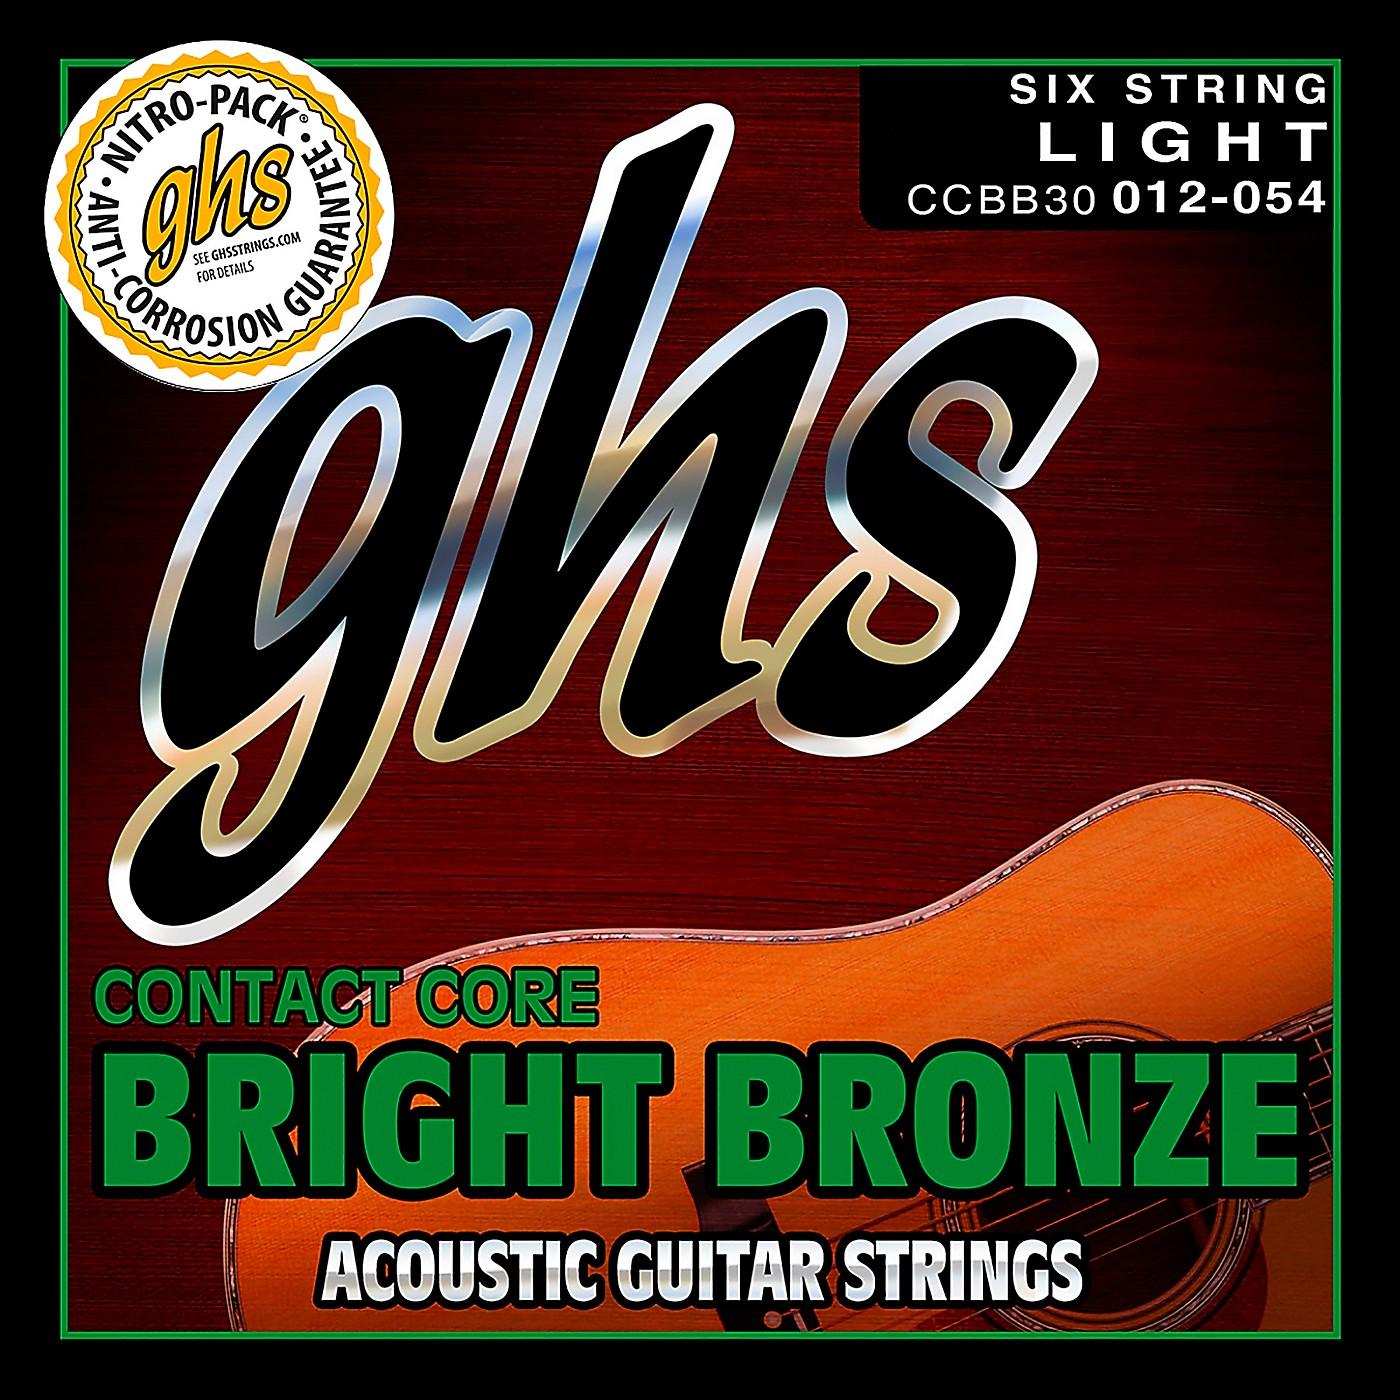 GHS Contact Core Bright Bronze Medium Acoustic Guitar Strings (12-54) thumbnail